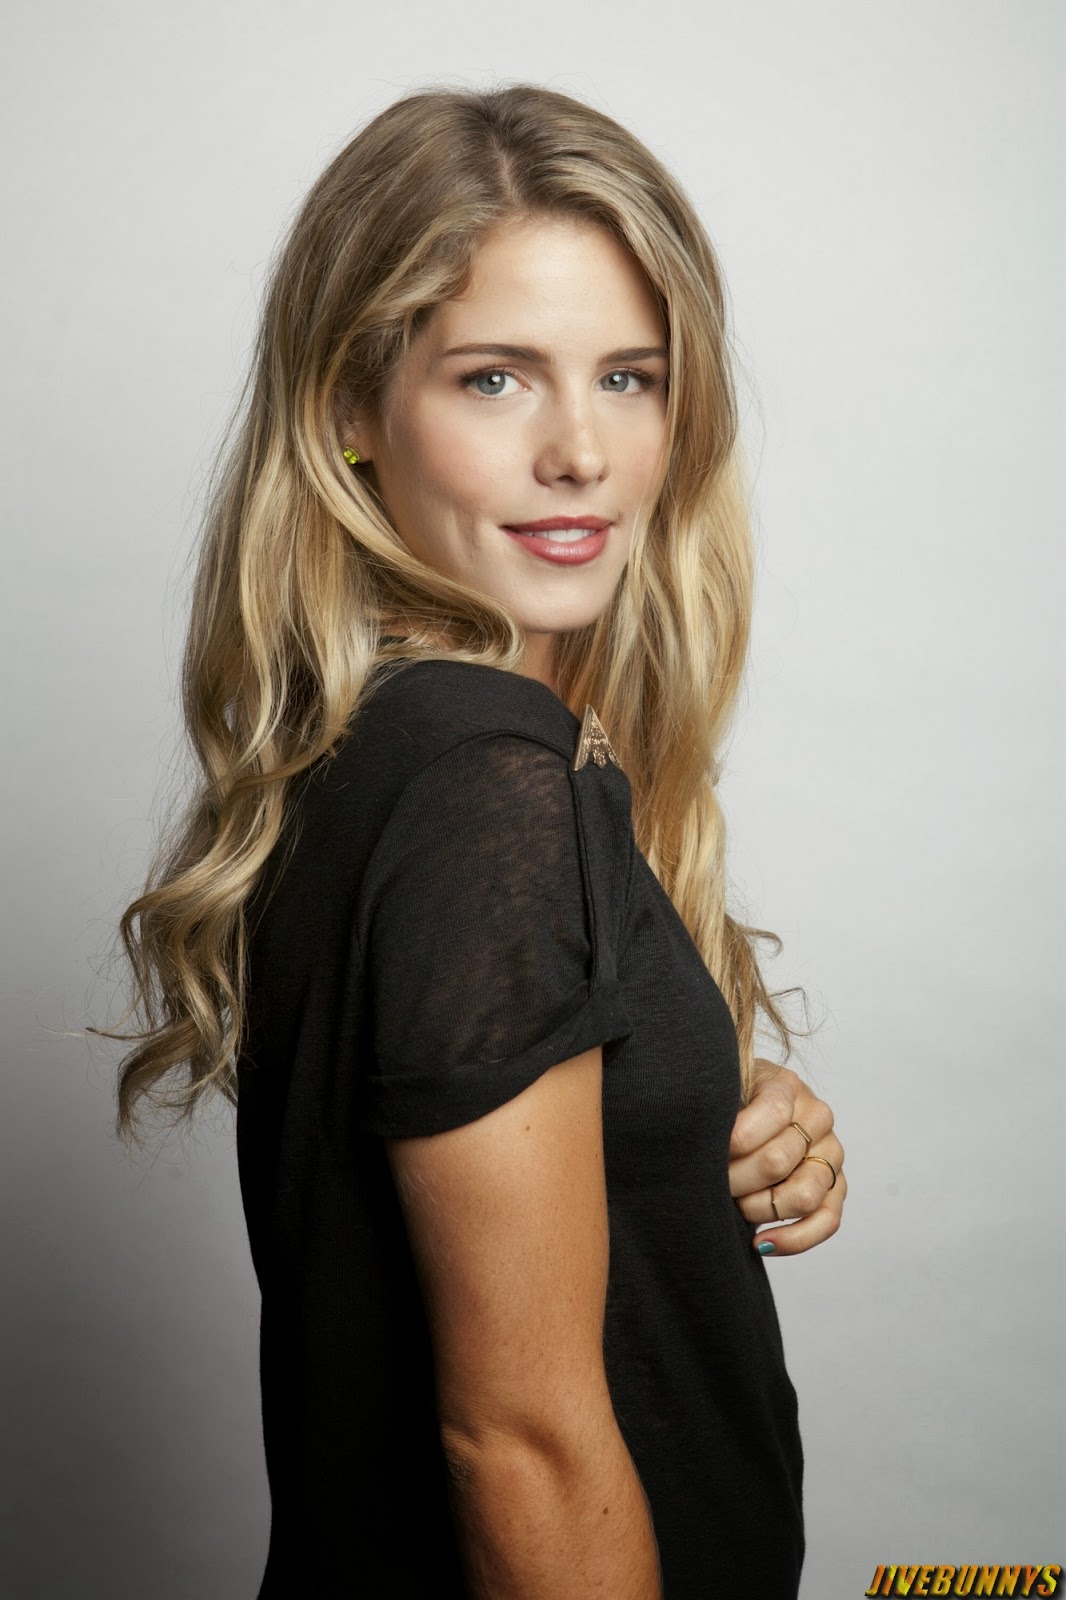 Adriana Lima Age >> Emily Bett Rickards Hot Actress Photos Gallery 1 - Indian Actress Hot Photos and HD Wallpapers